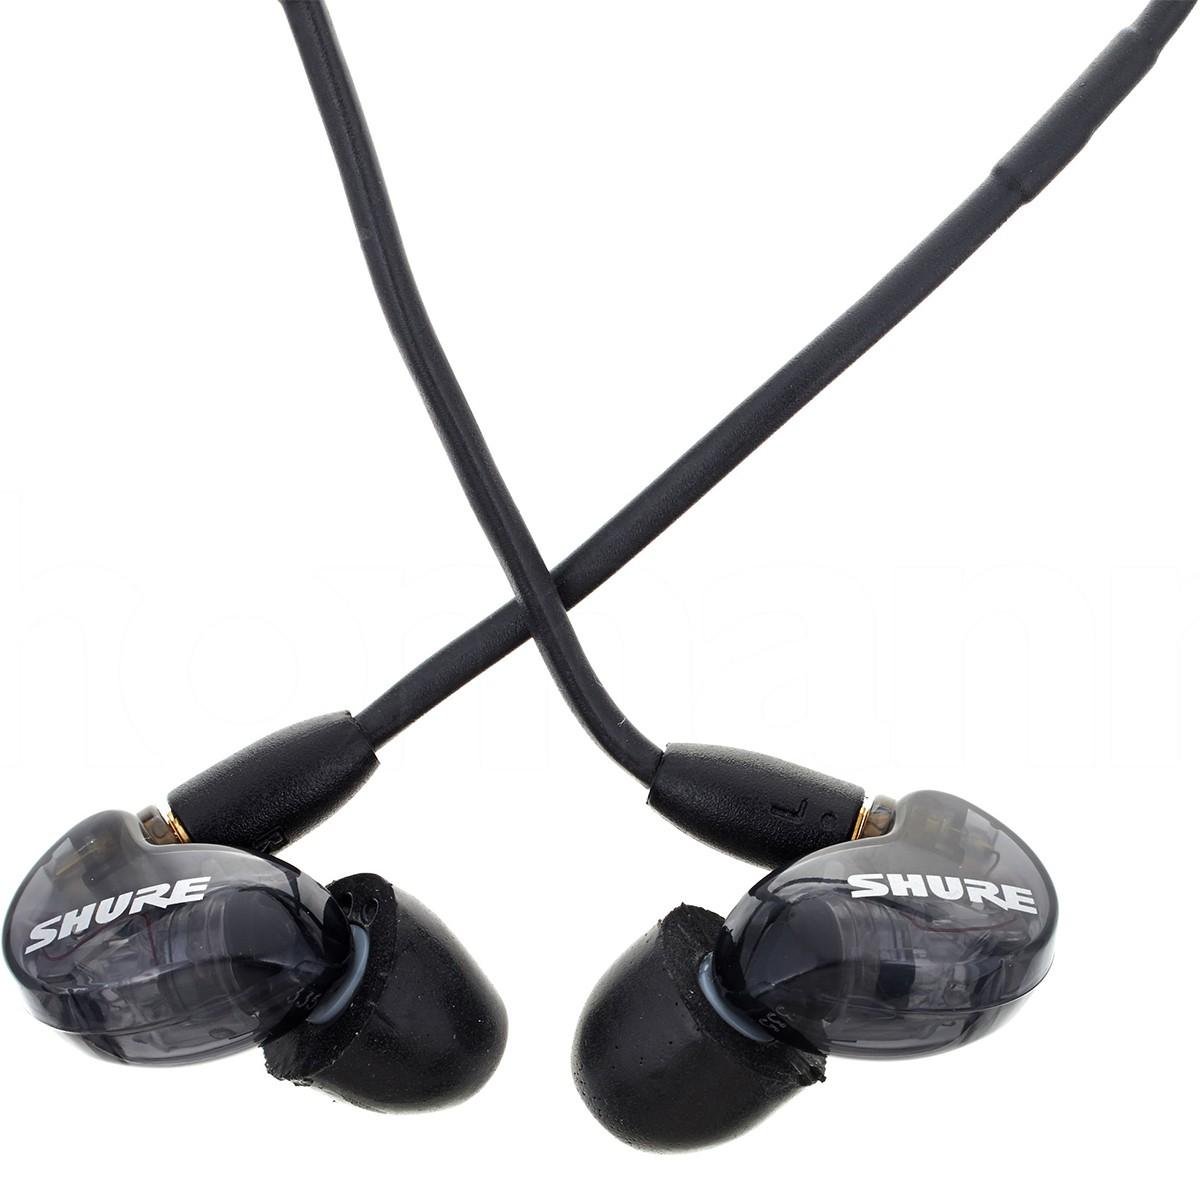 Shure SE215-K Preto Fone In-Ear, Reduz Ruído